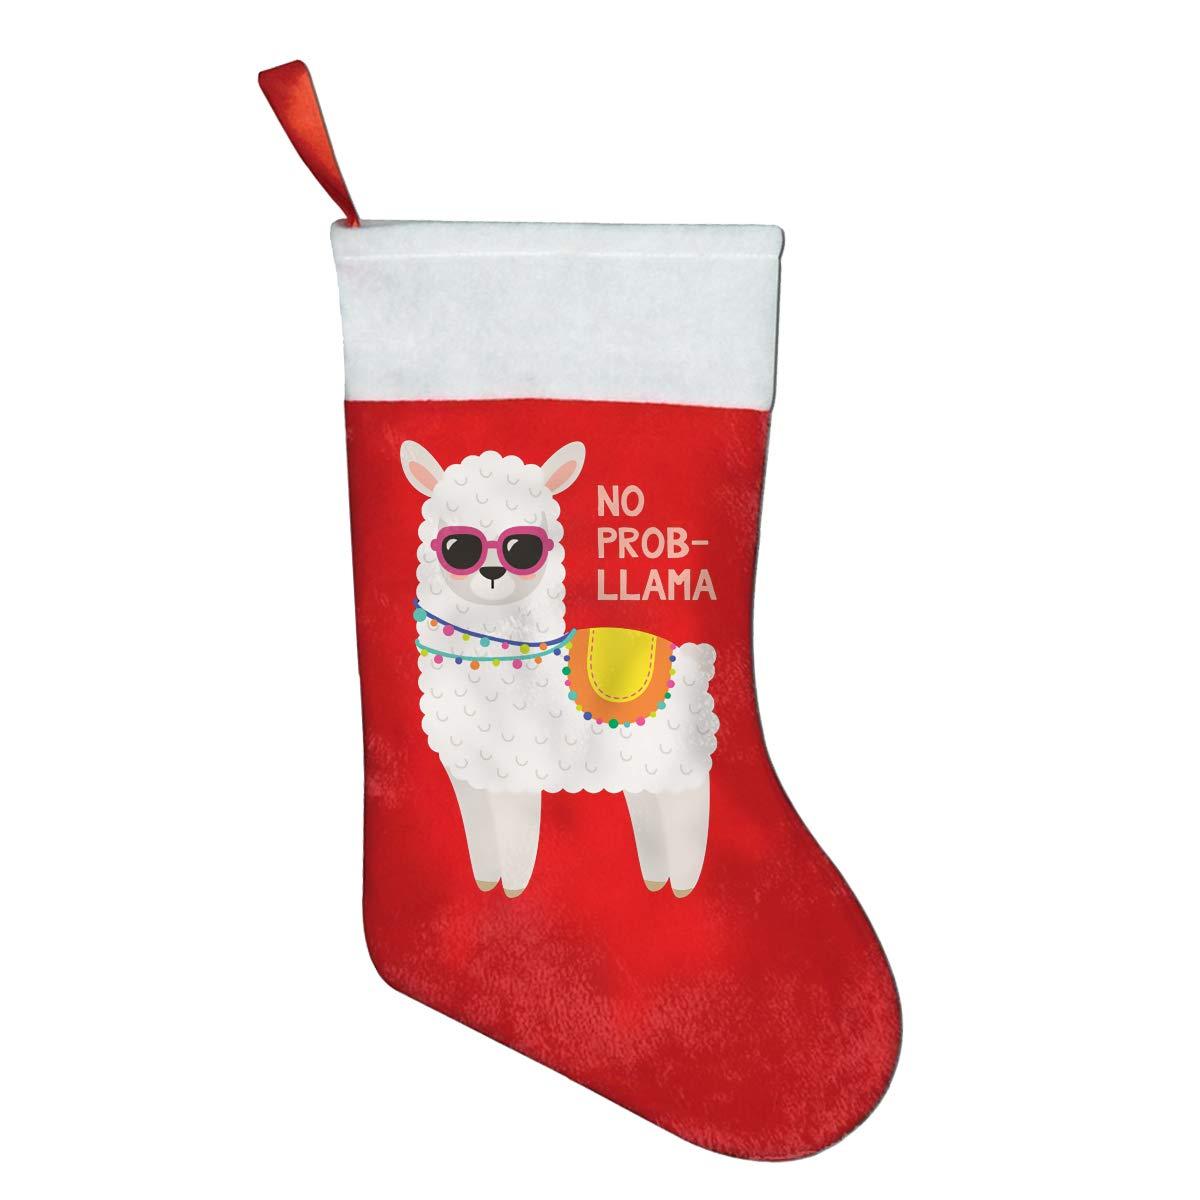 Llama Christmas Stocking.Amazon Com Faceti No Prob Llama Sunglasses Personalized